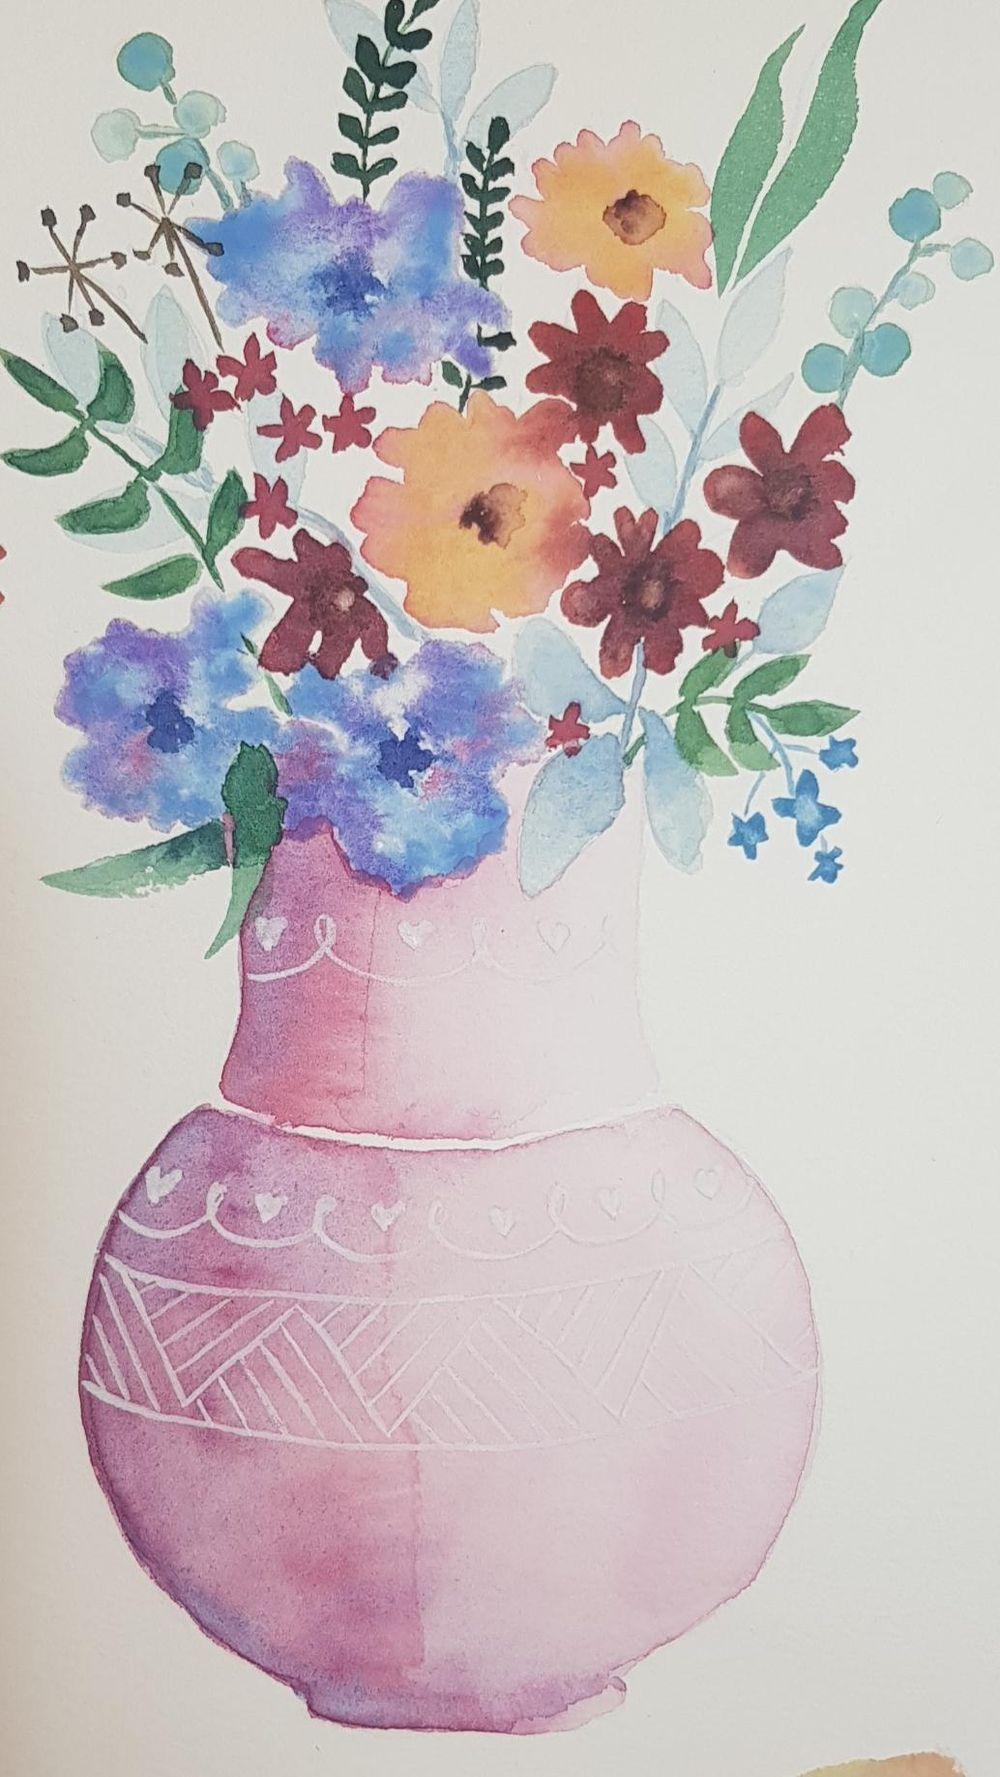 Flower vase 2 - image 1 - student project